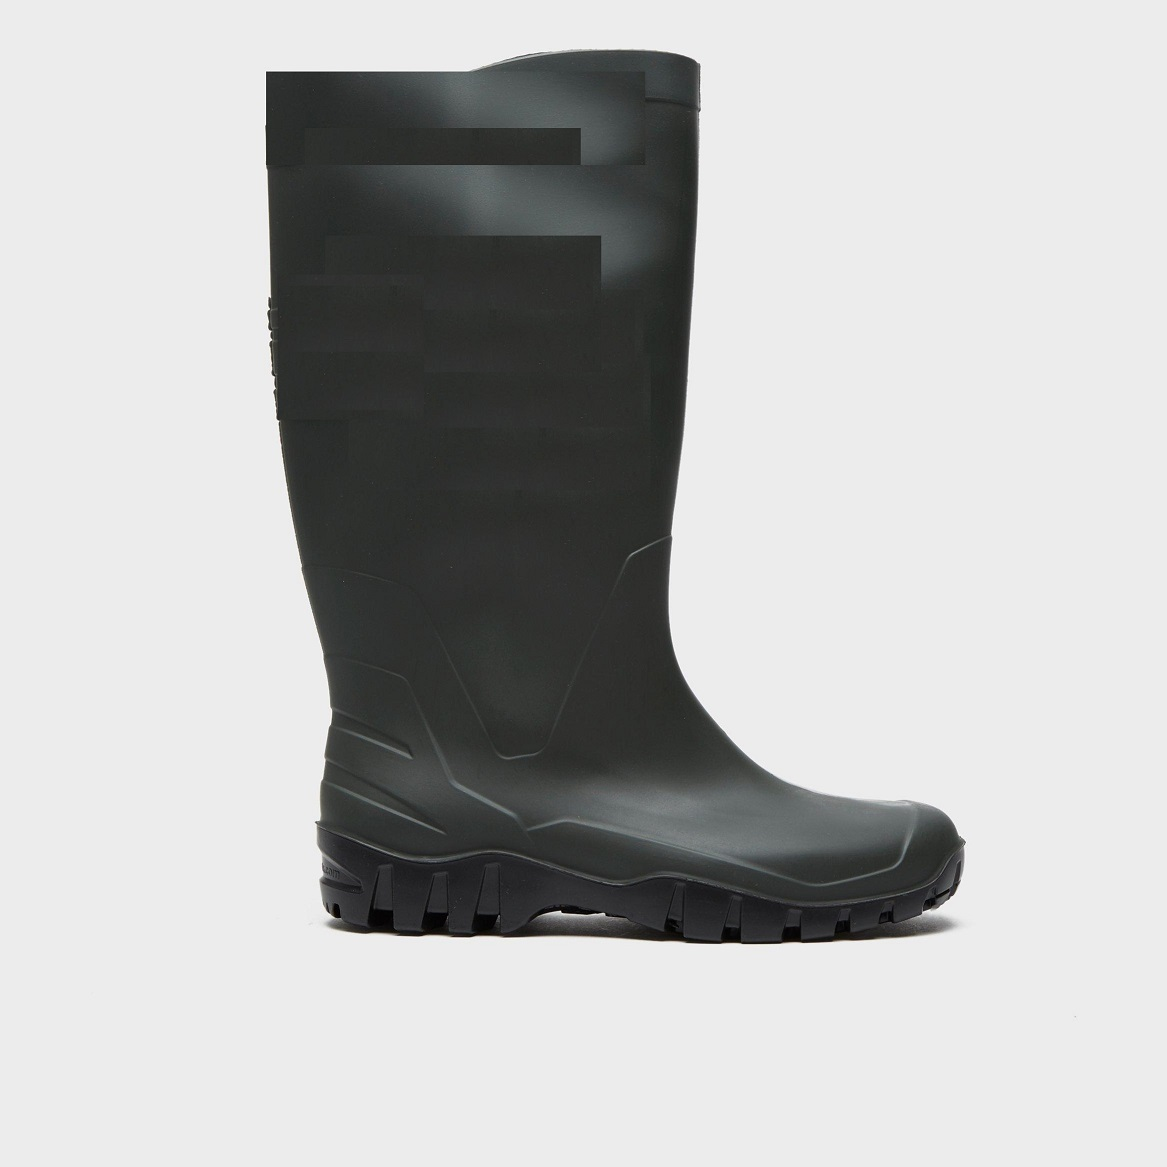 Soft Toe Wellington Boots Size 12